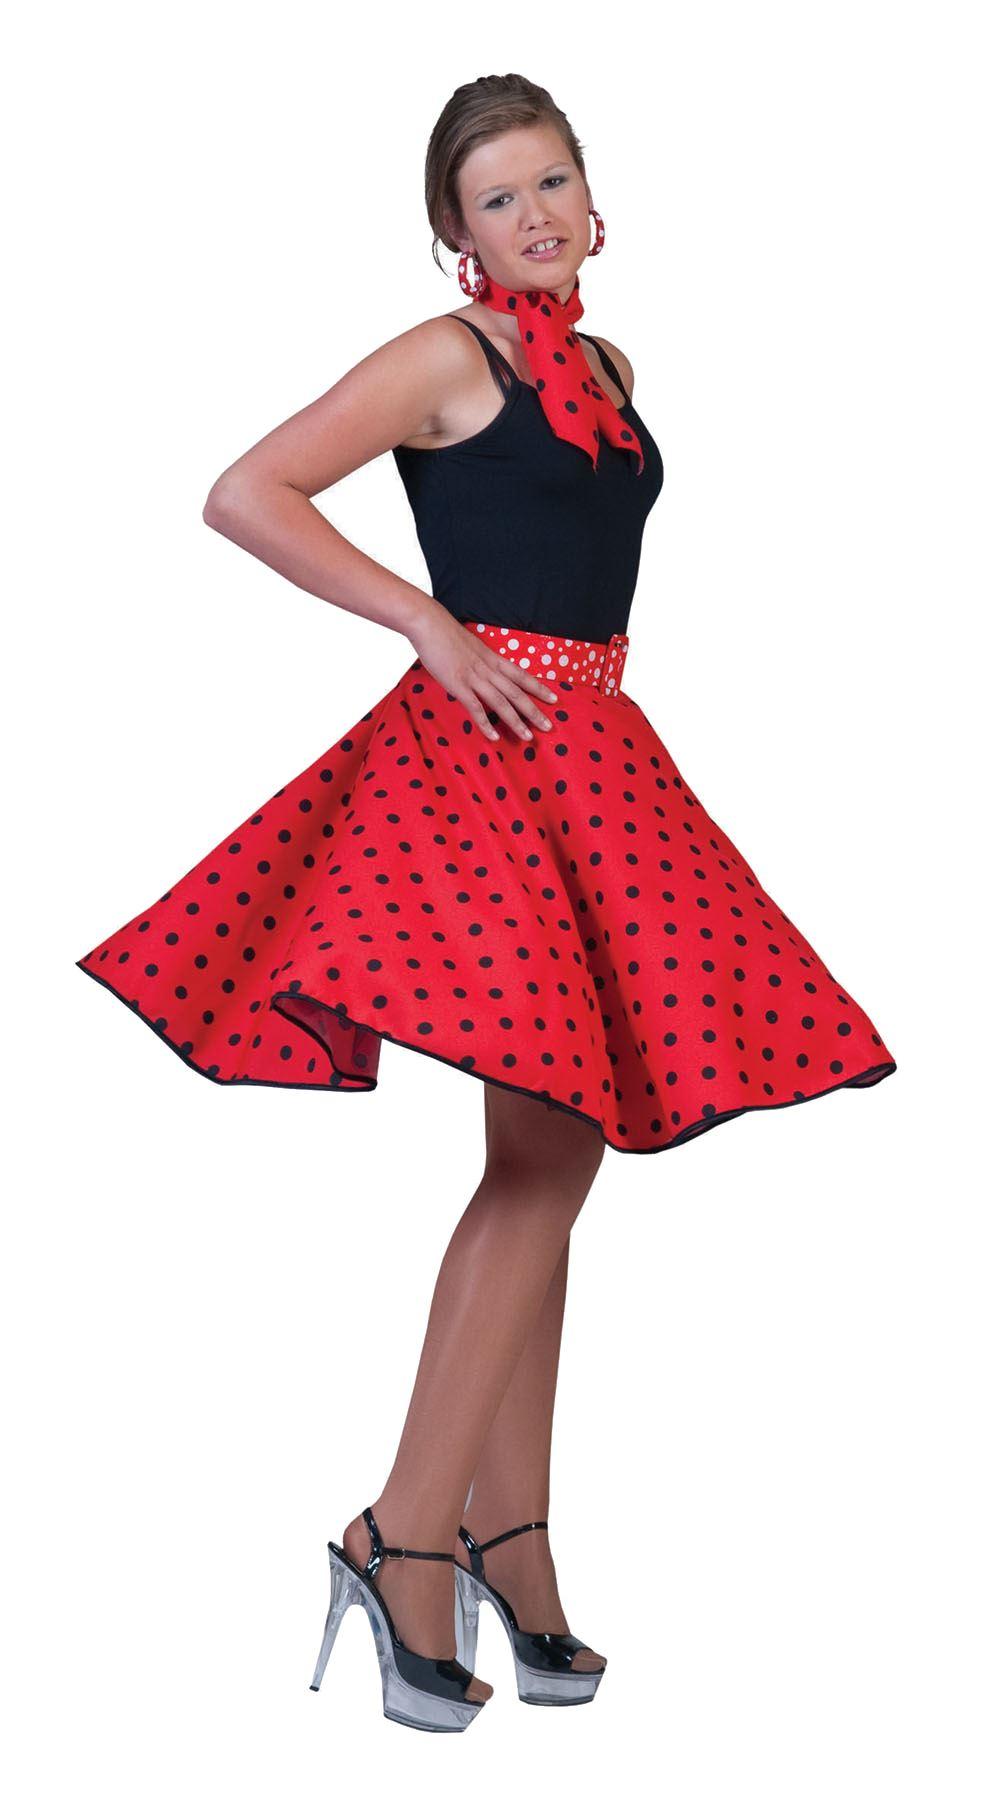 ladies polka dot rock n roll skirt scarf 50s 60s fancy. Black Bedroom Furniture Sets. Home Design Ideas